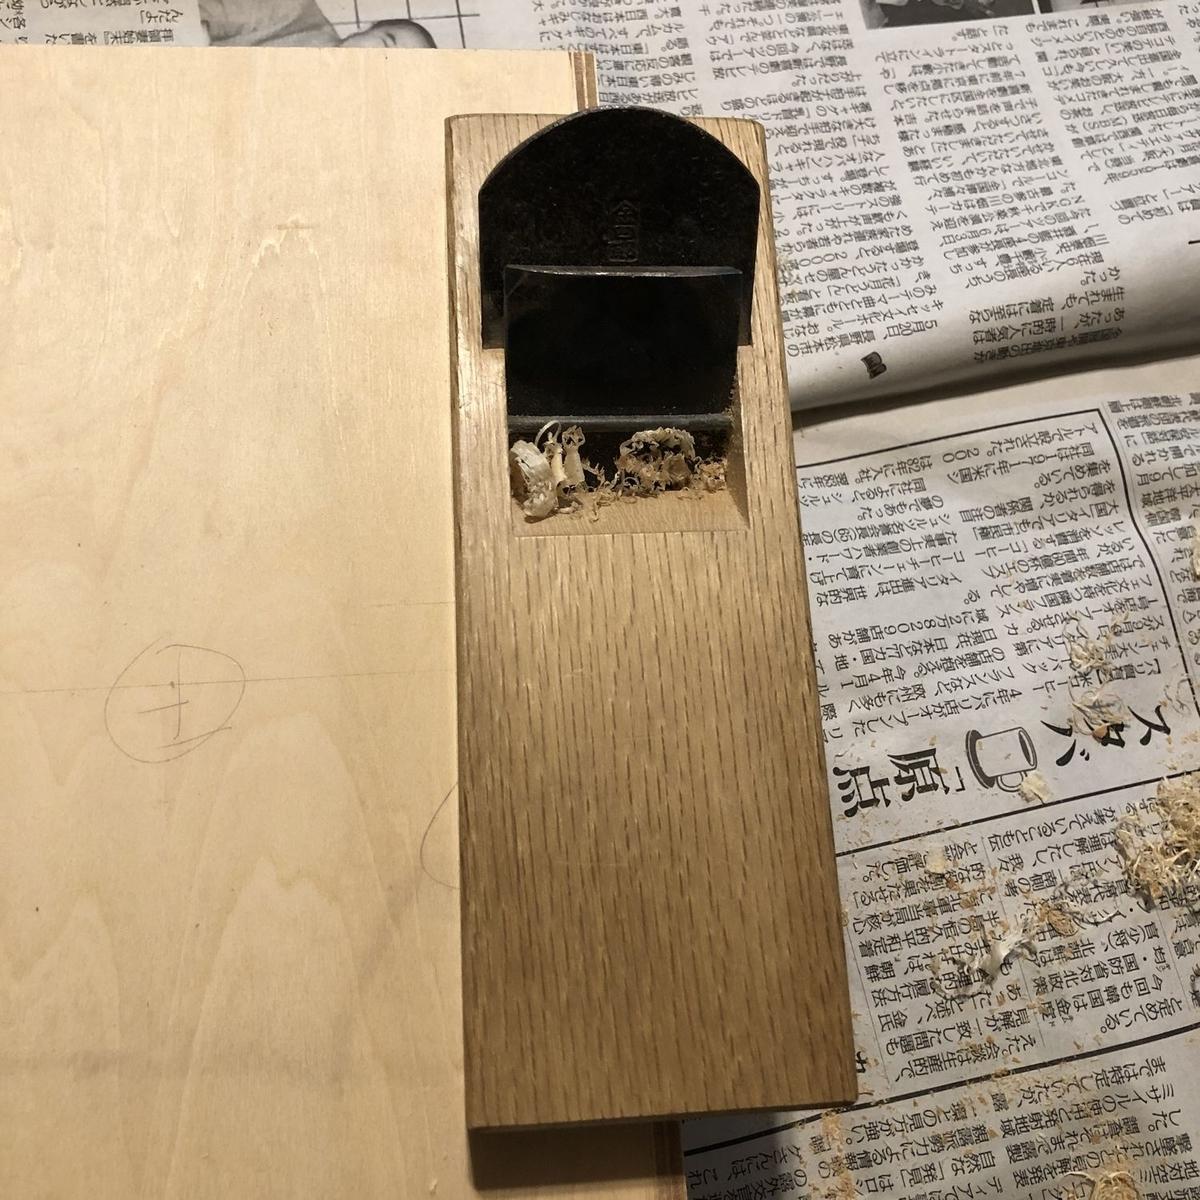 f:id:shiratsume:20200110134129j:plain